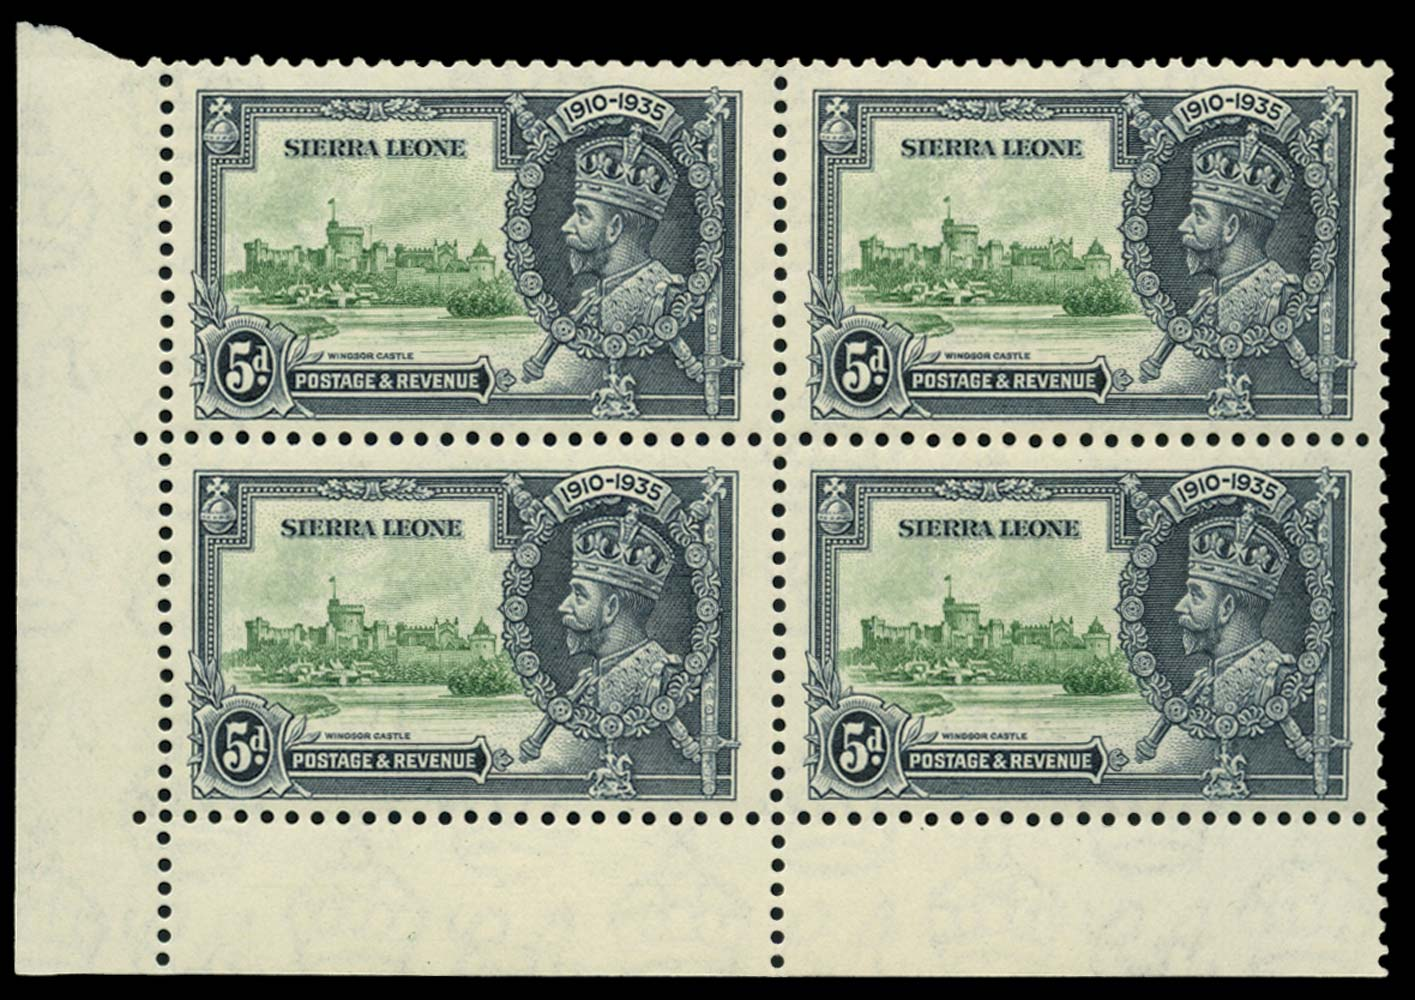 SIERRA LEONE 1935  SG183/a Mint